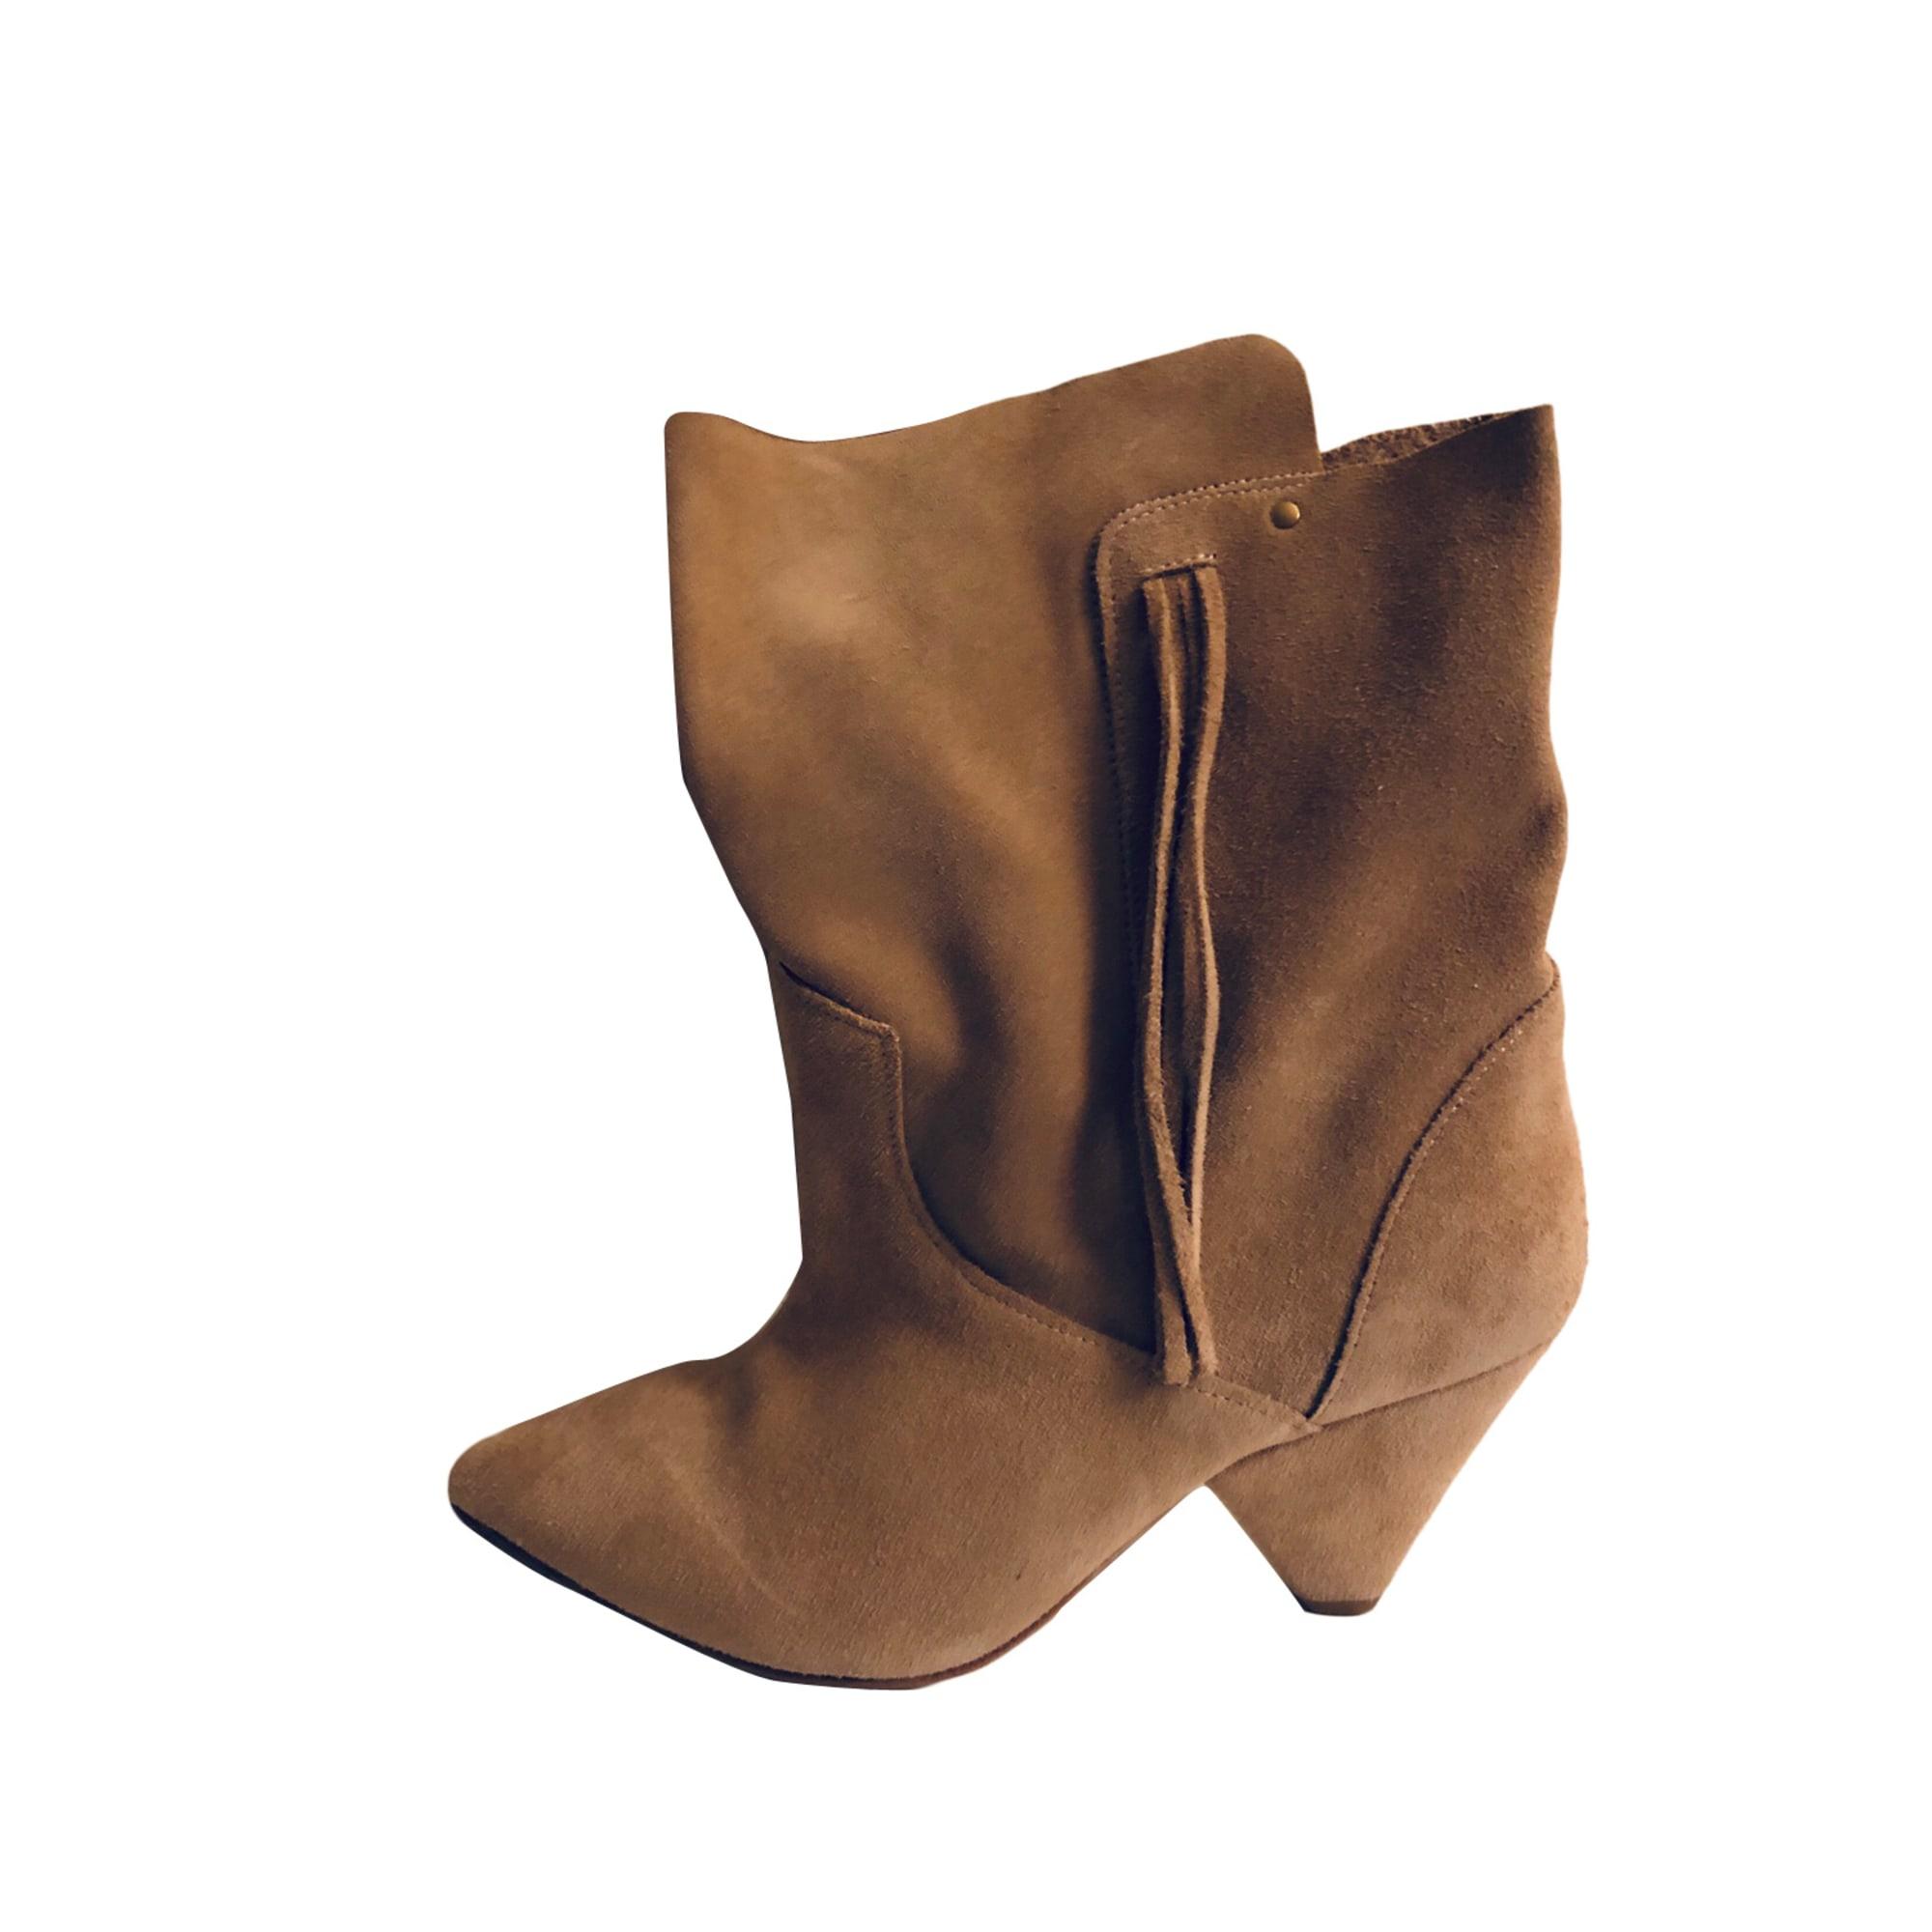 High Heel Ankle Boots JEROME DREYFUSS Beige, camel